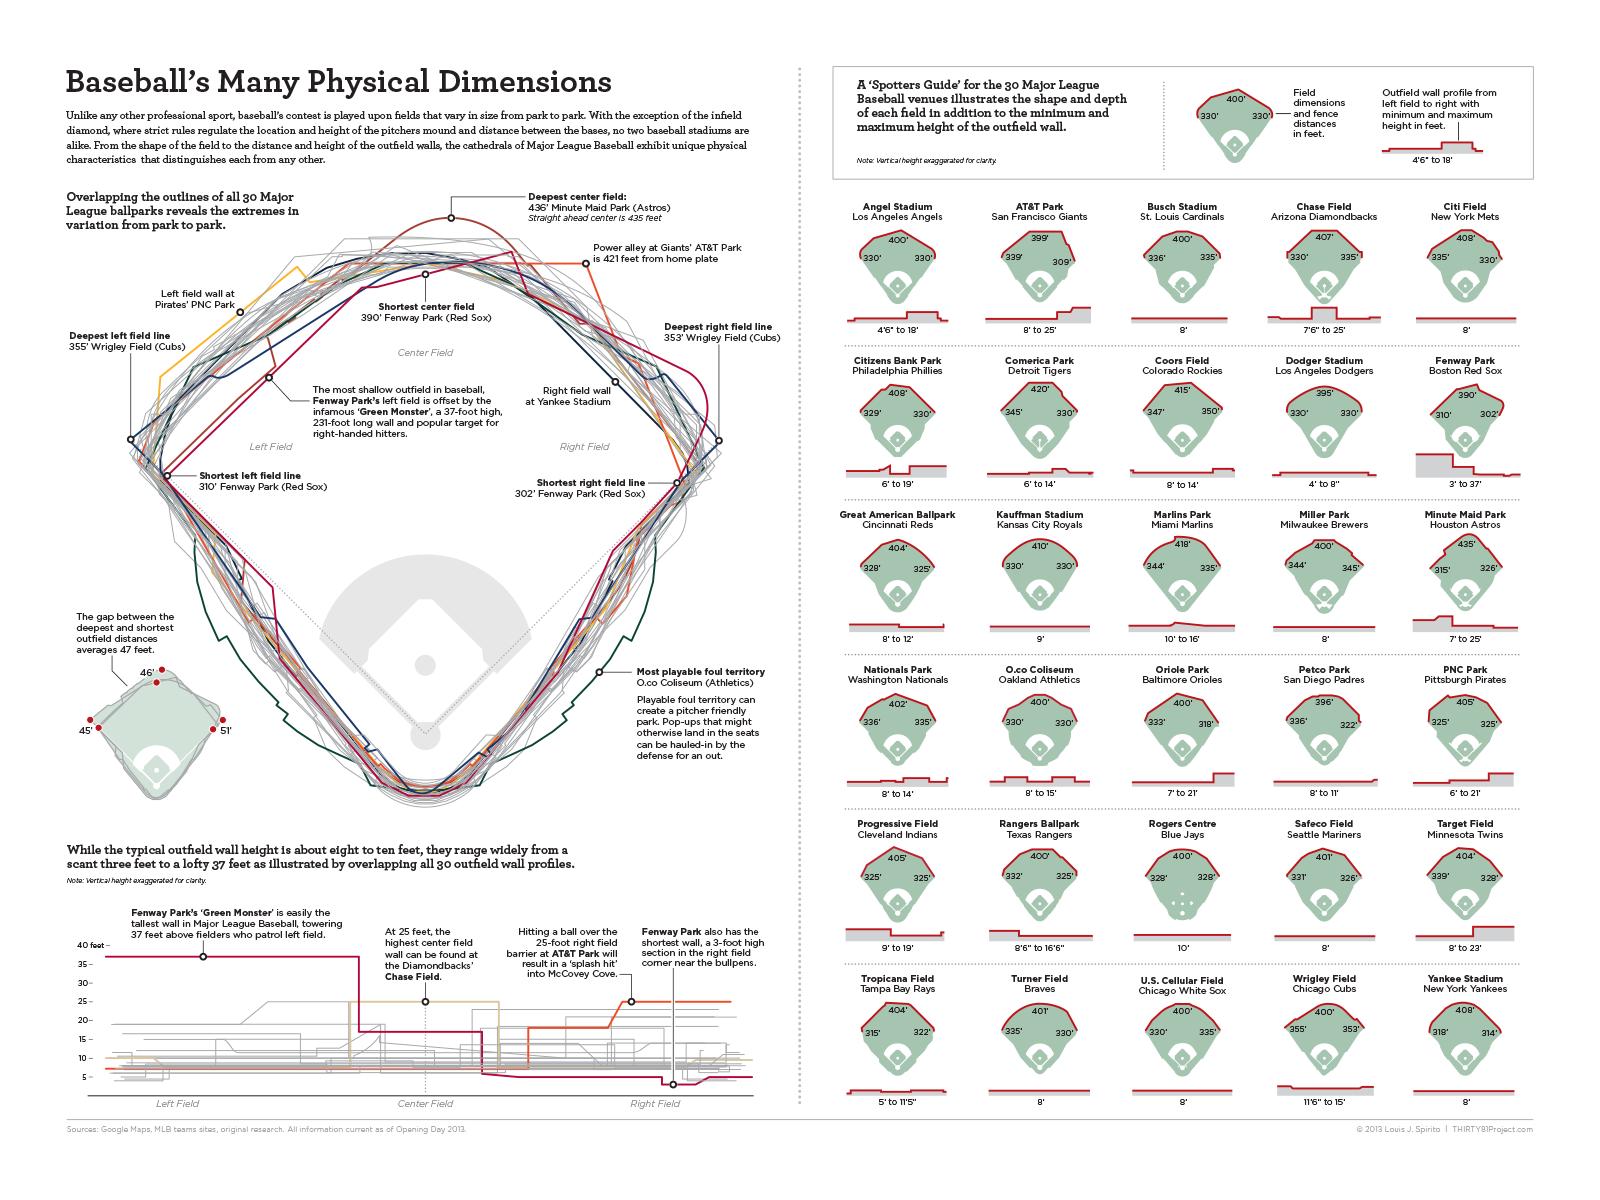 Baseballs many physical dimensions visual instructional baseballs many physical dimensions visual pooptronica Images